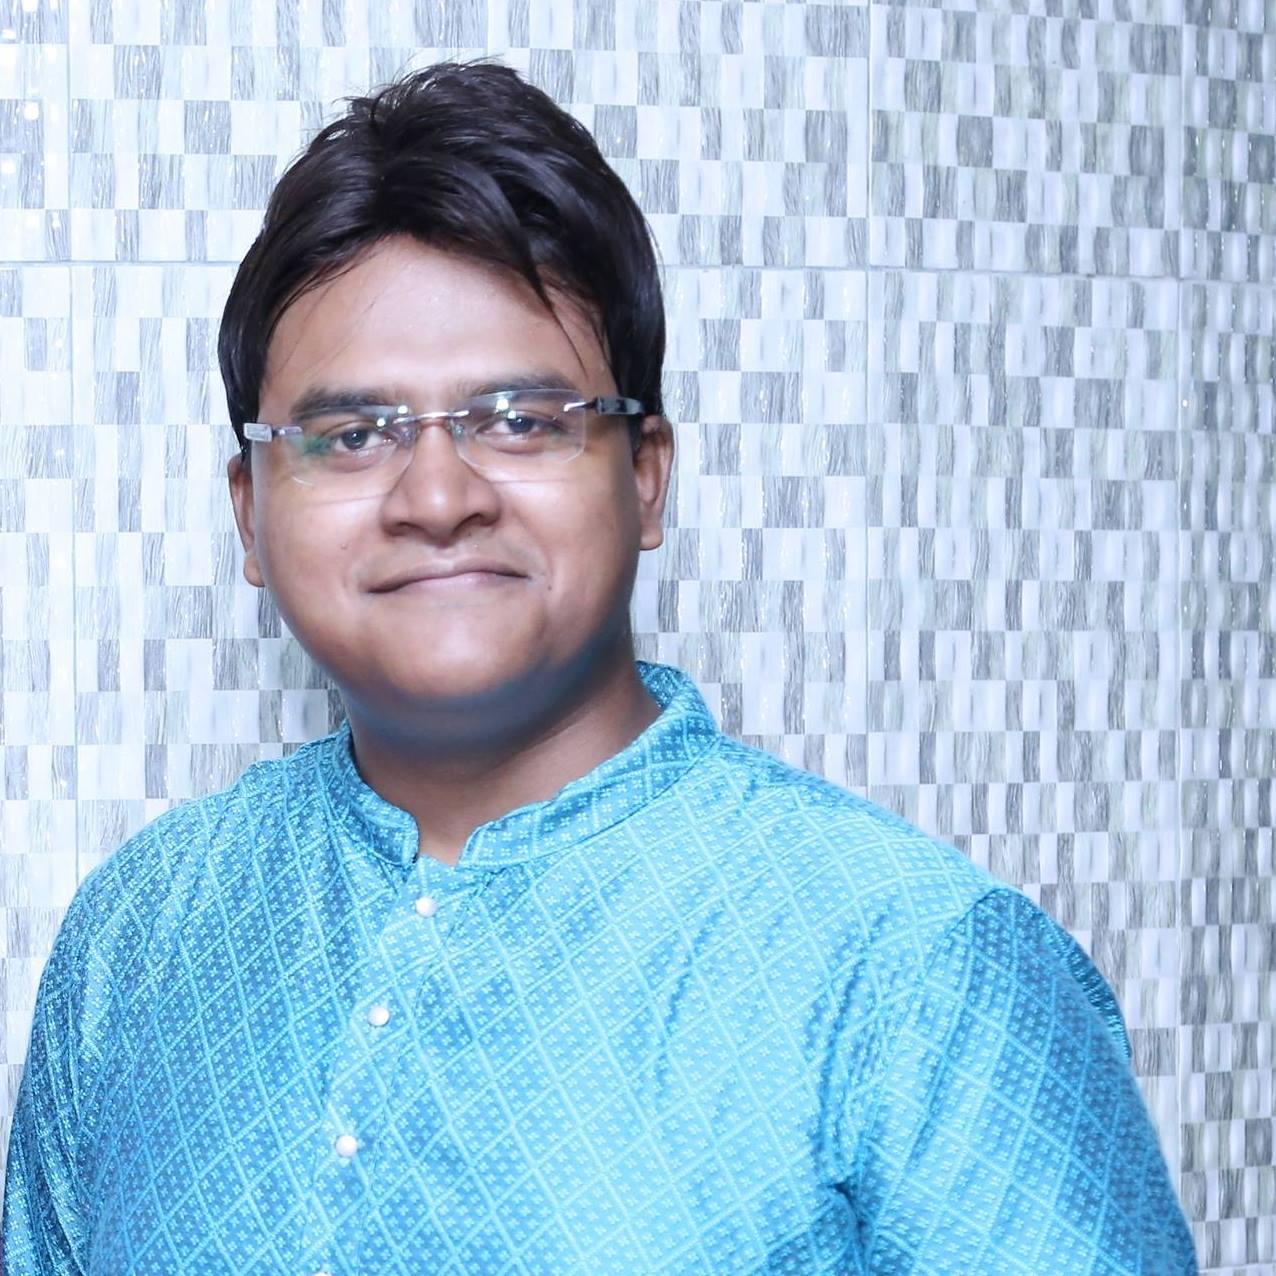 Rashed Reza Chowdhury Arif